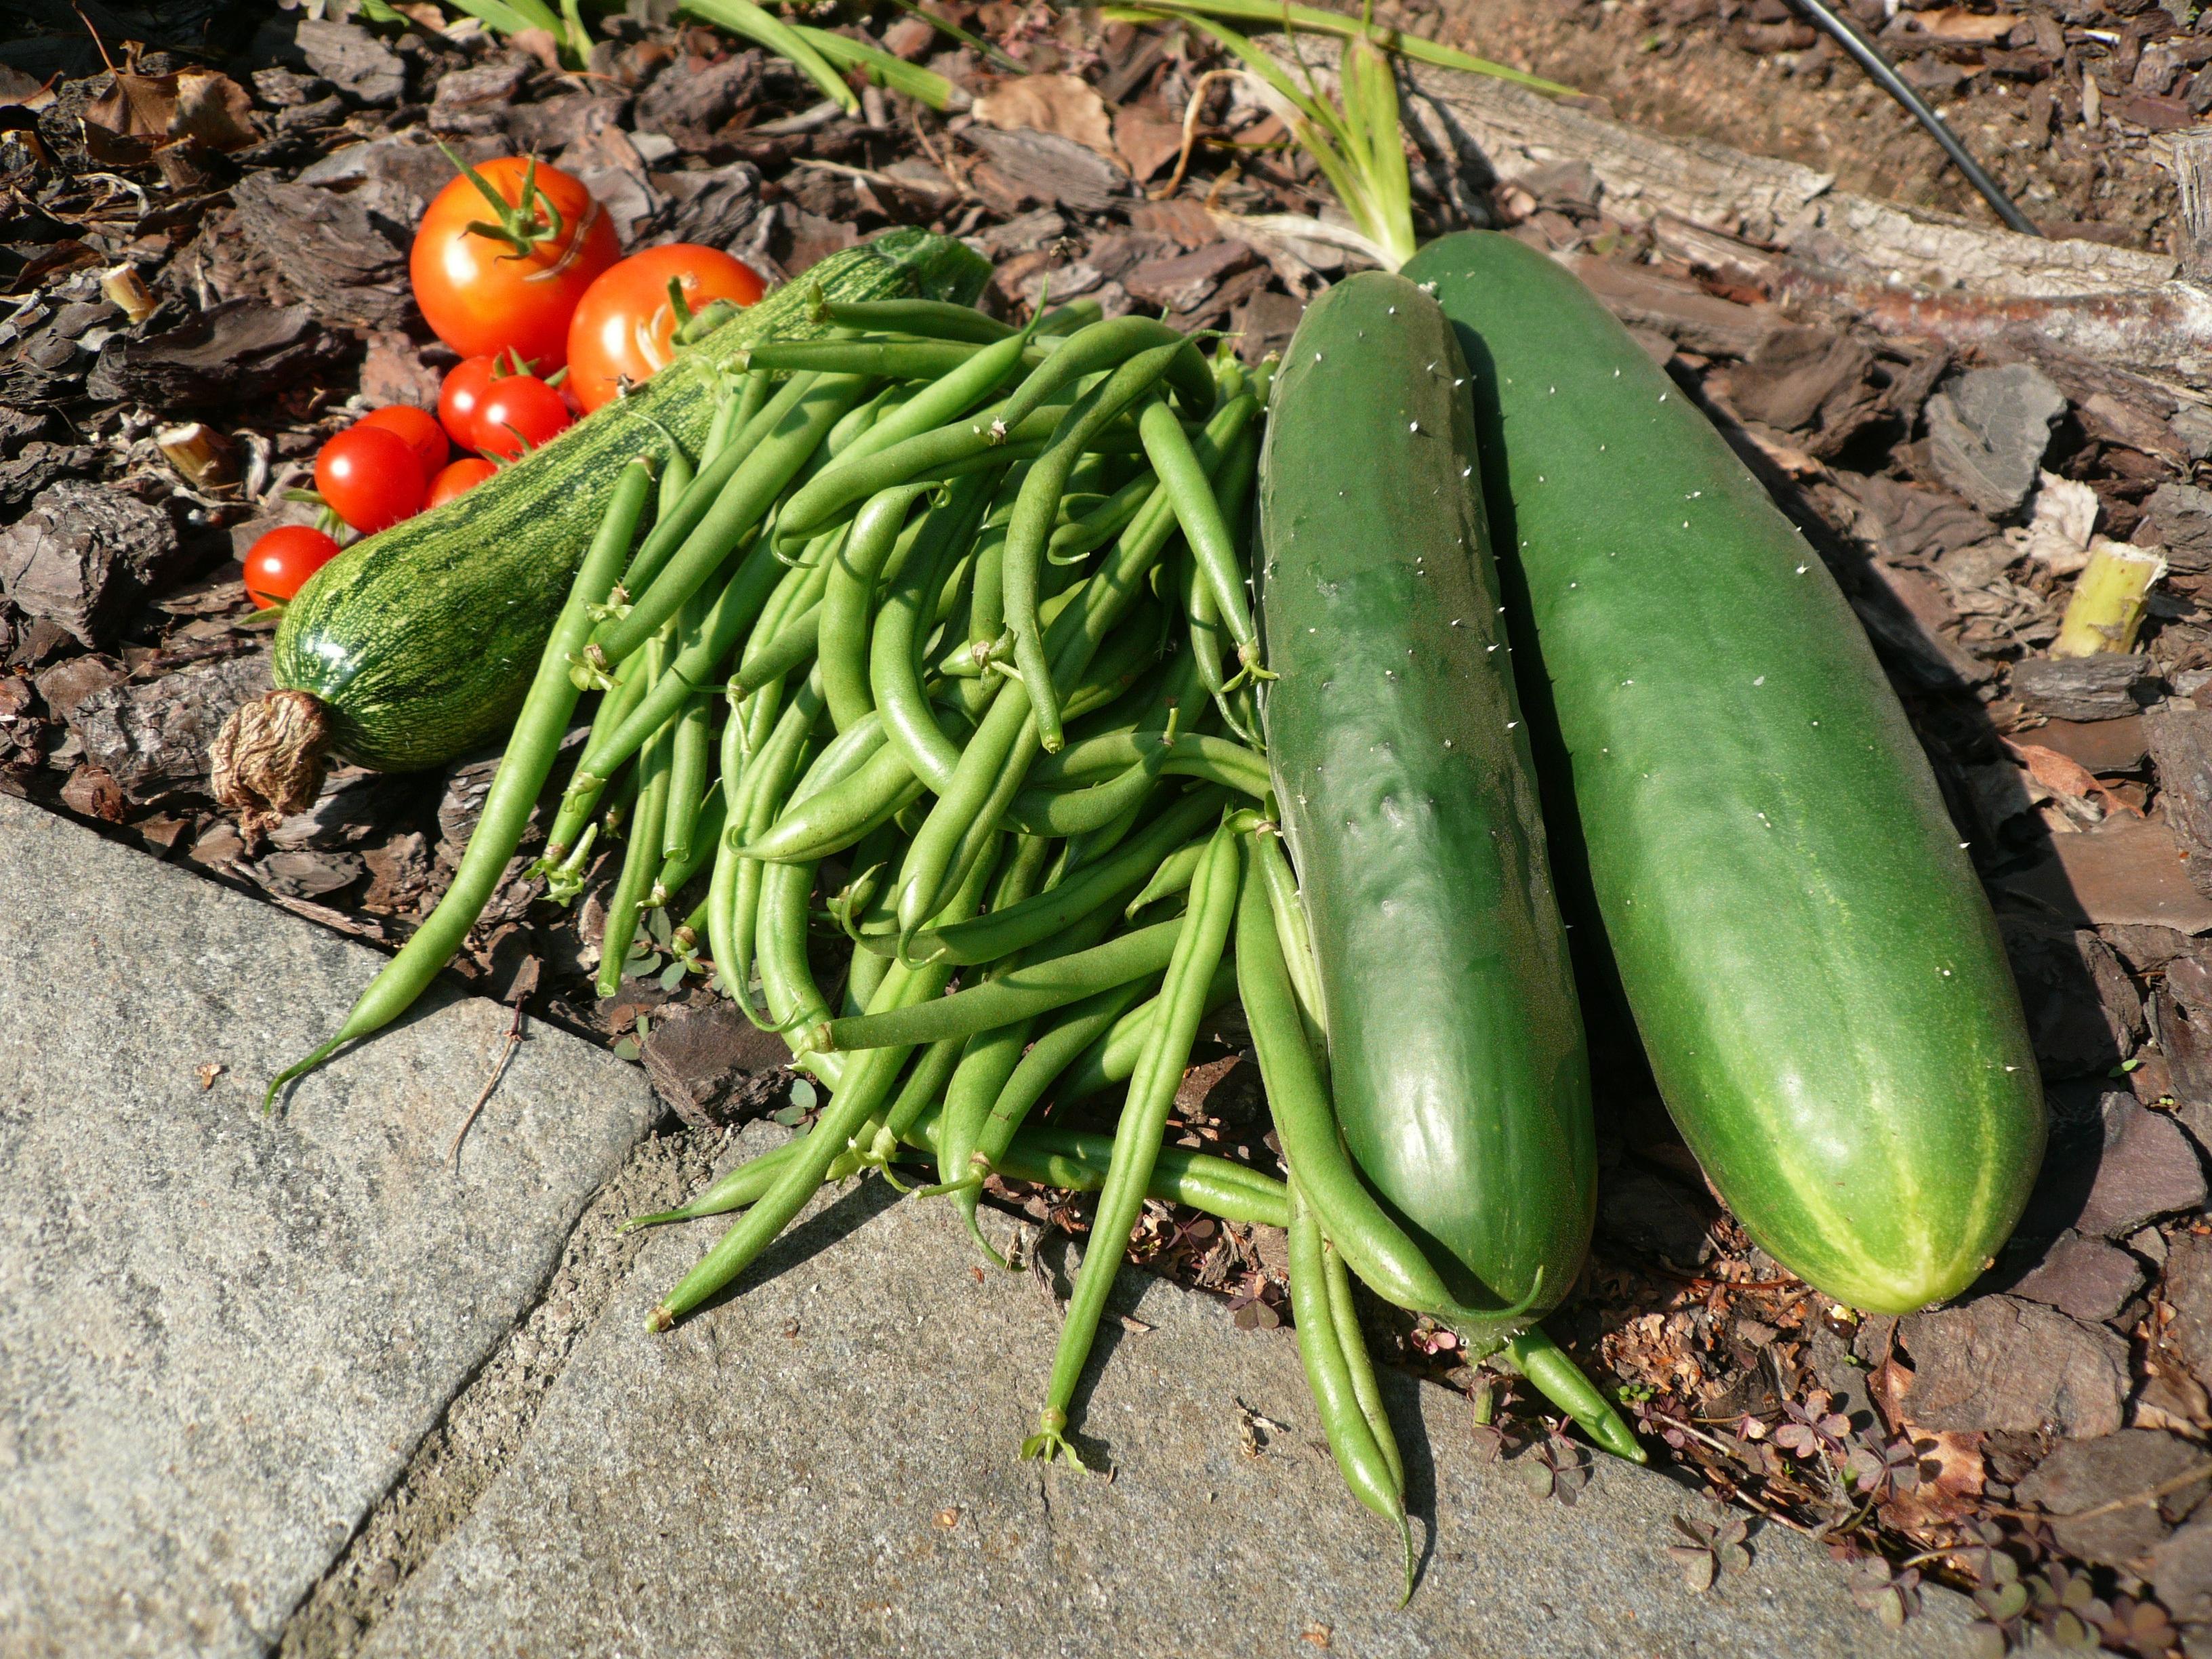 planta fruta produce vegetal vegetales pepino tomates vegetariano alimentos naturales cucumis comida local mercanca judas verdes public domain